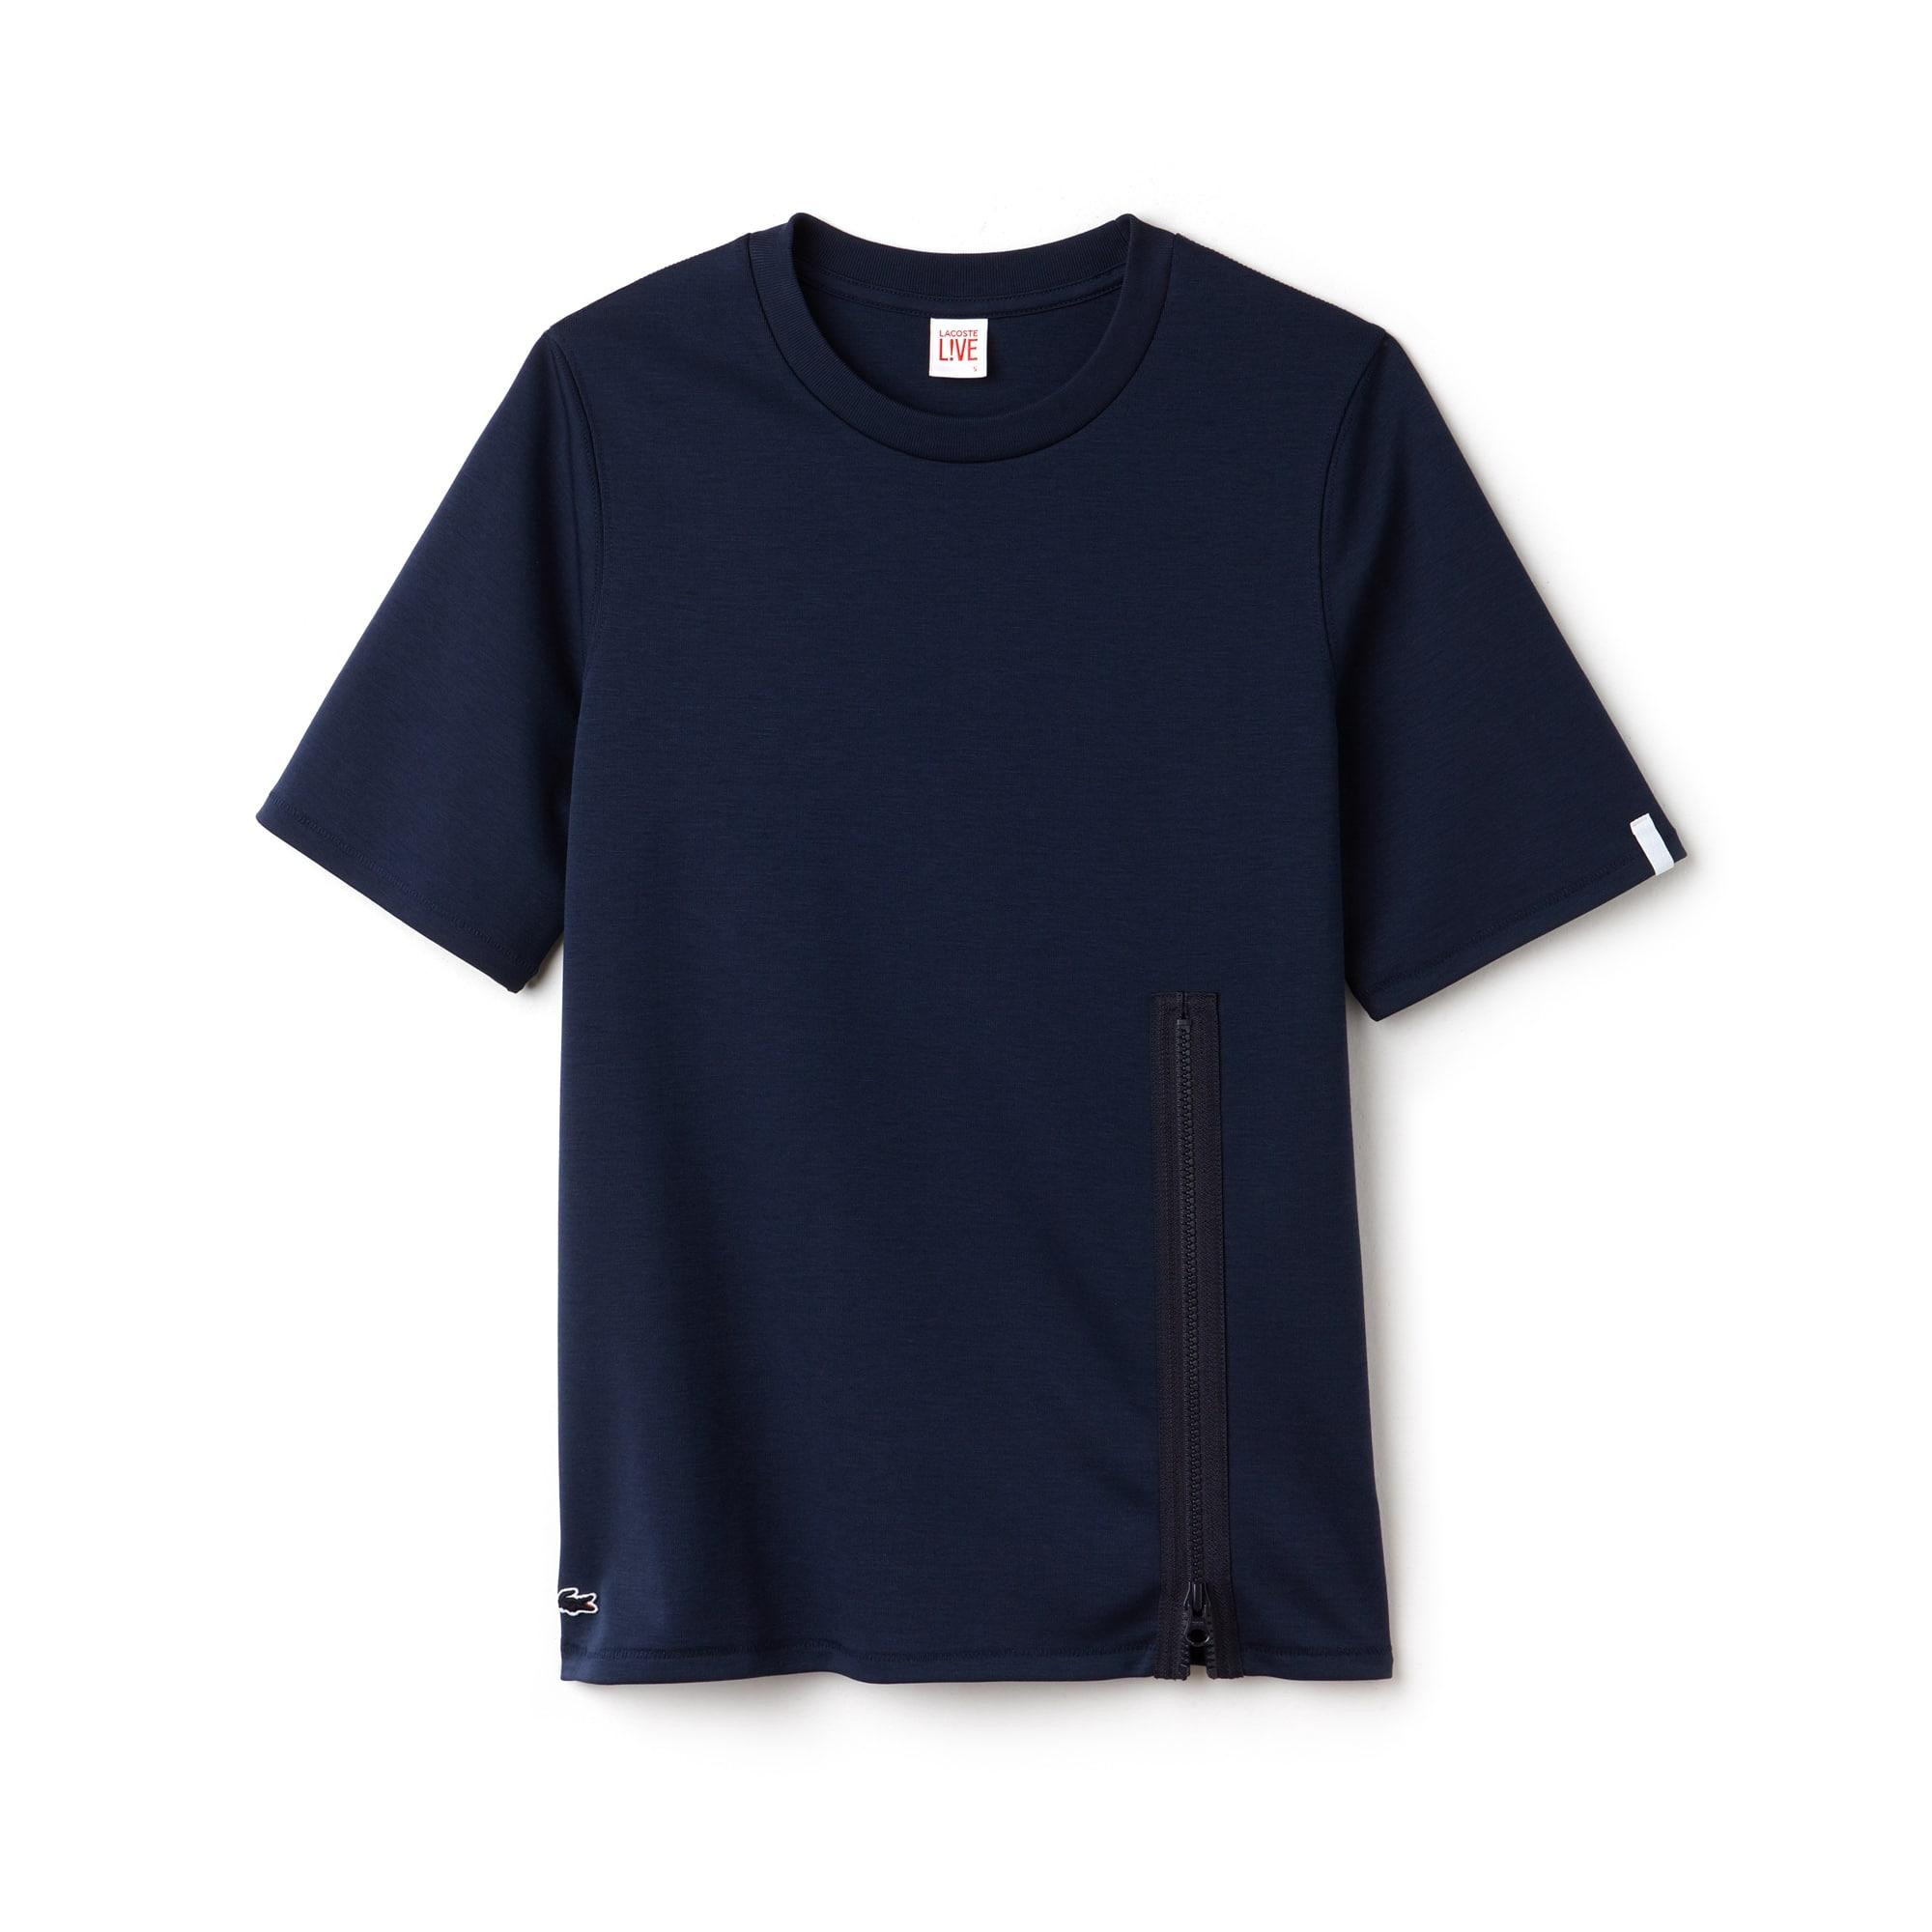 Camiseta Mujer Cremallera Lacoste Live